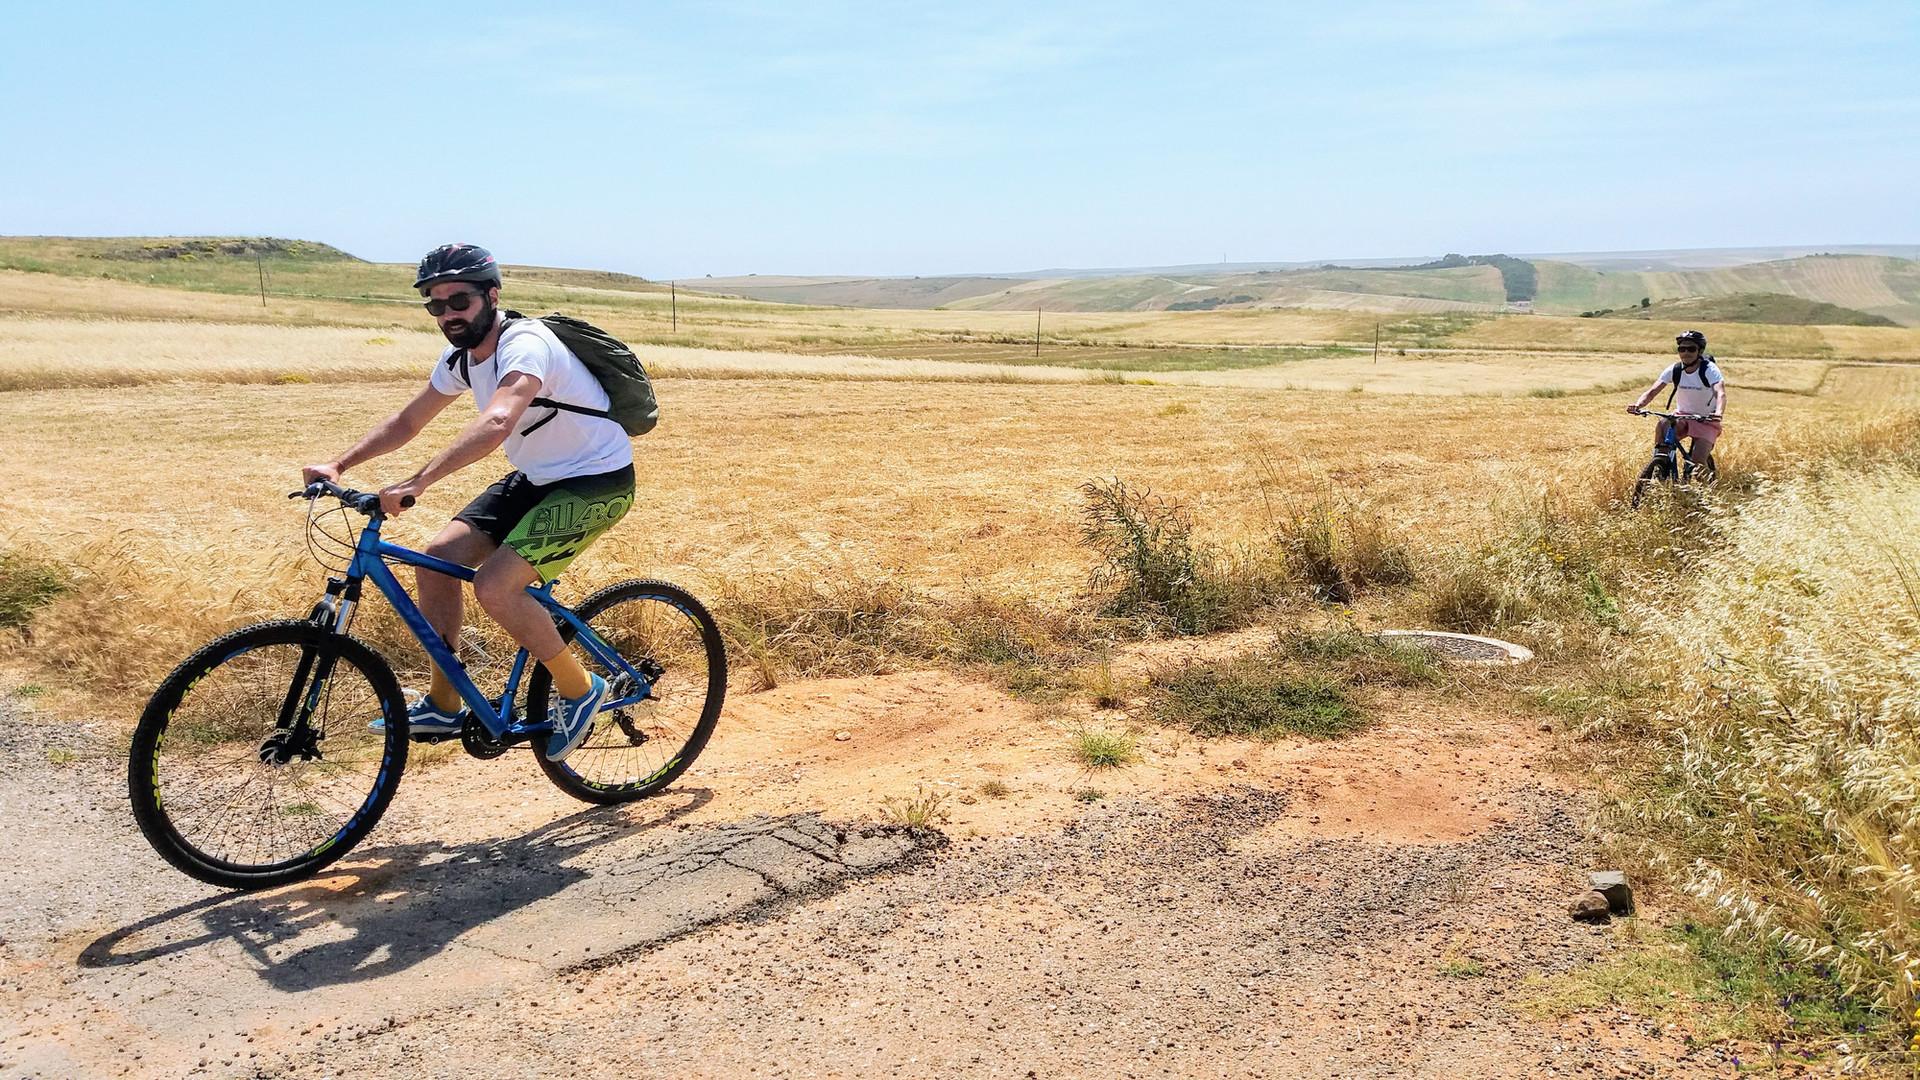 Ride through country lanes